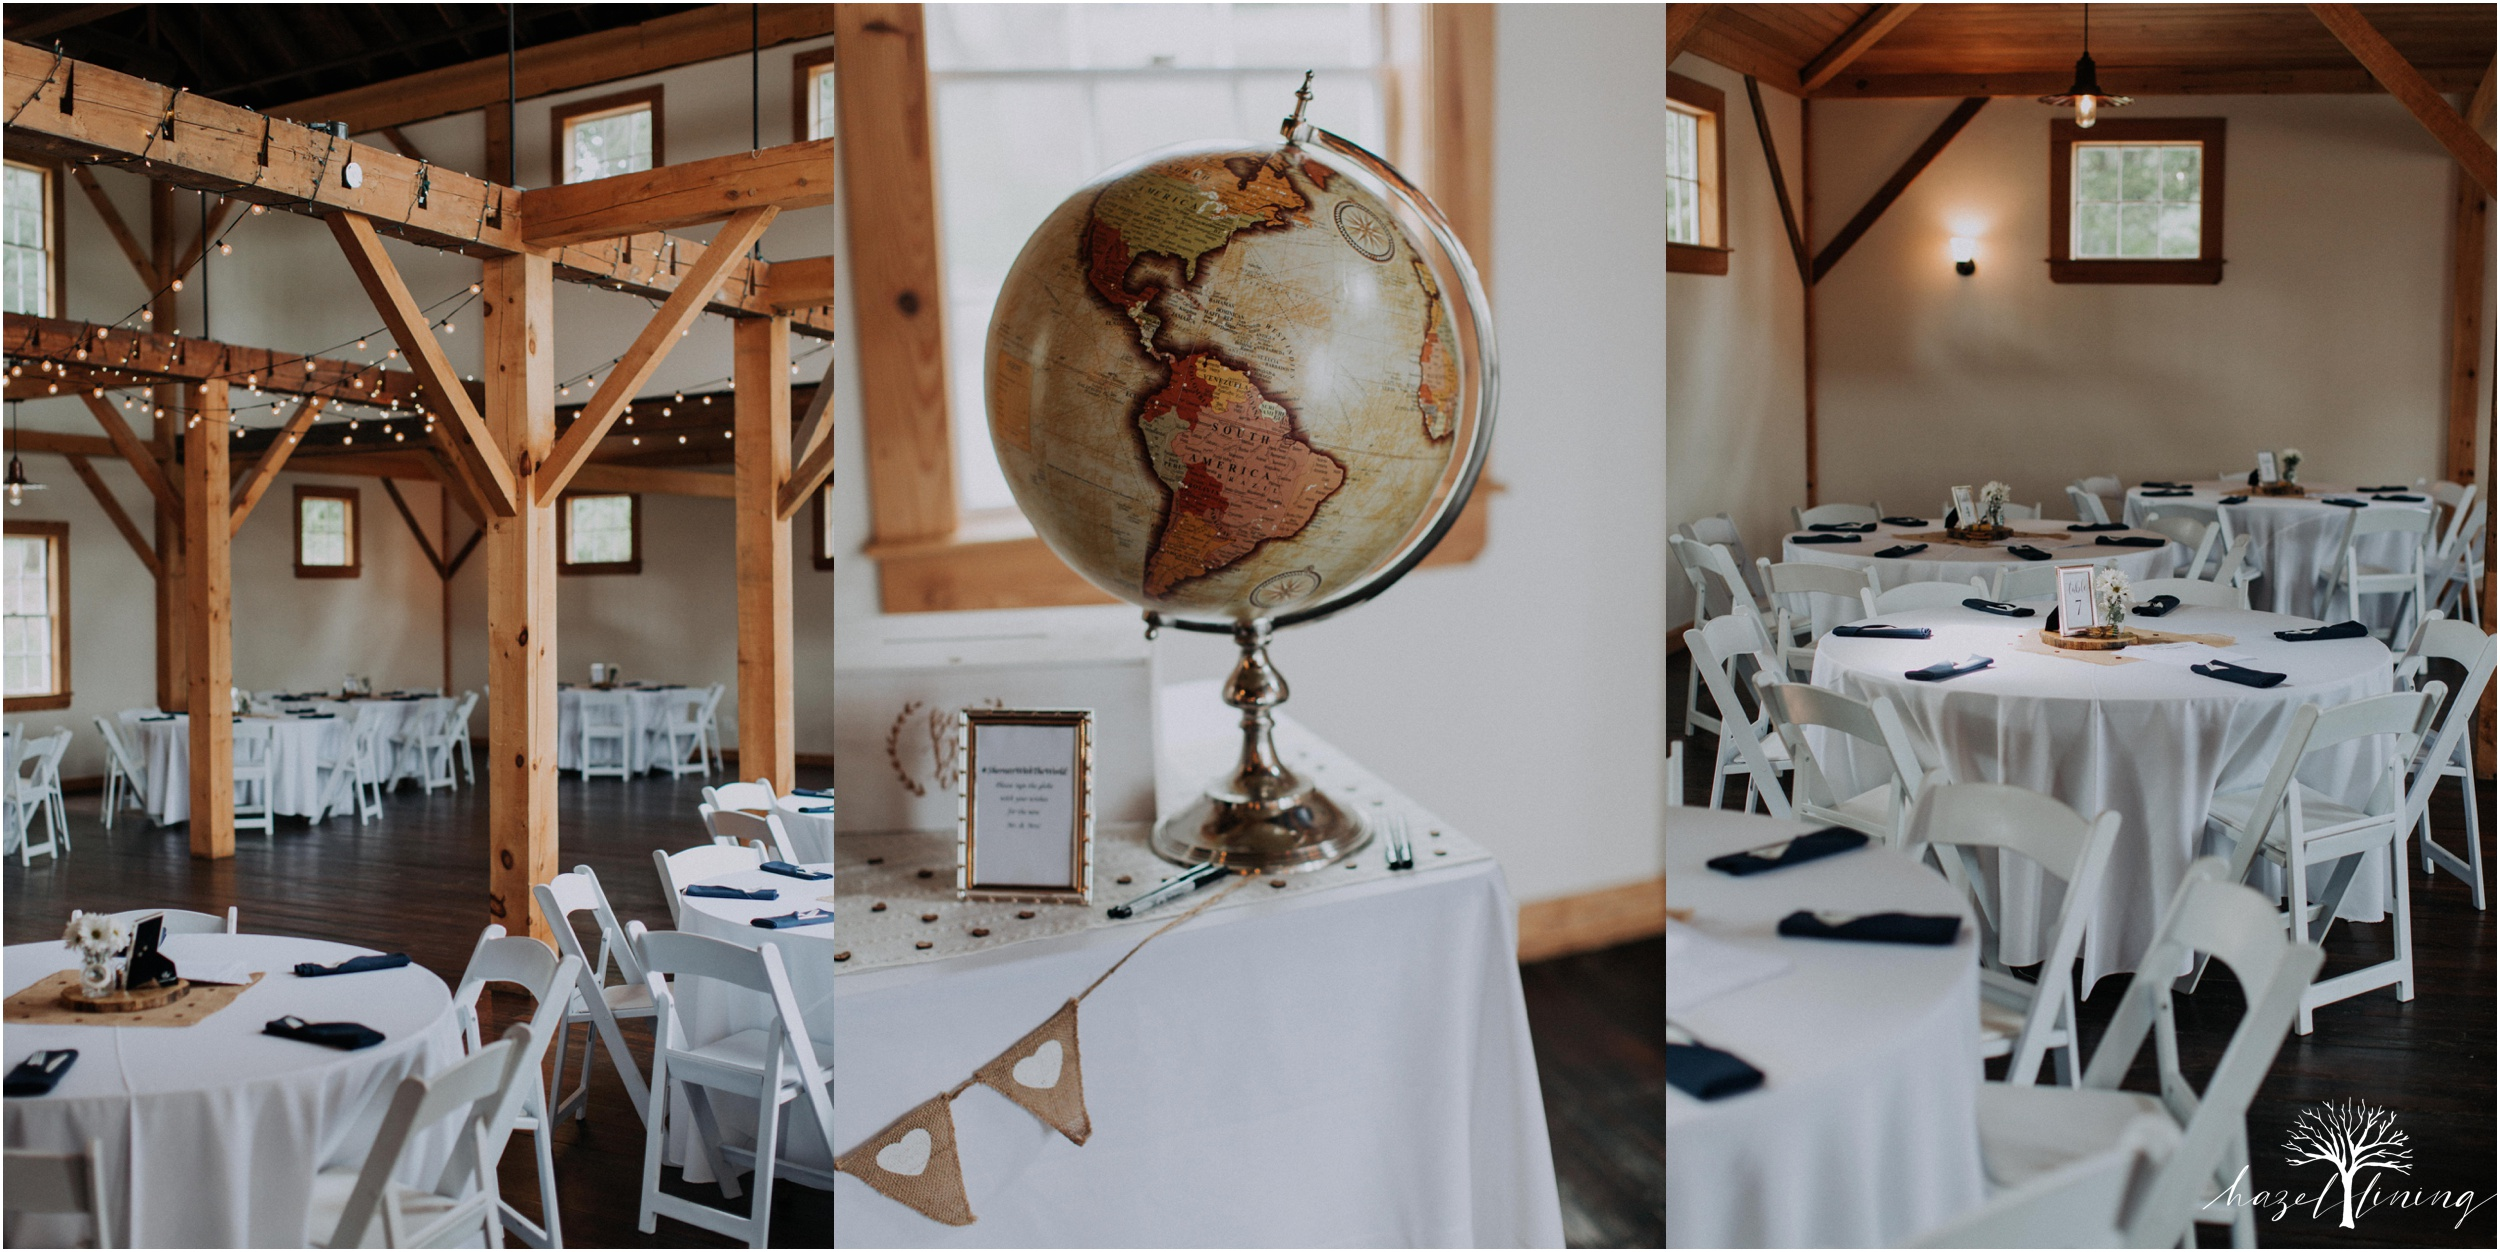 mariah-kreyling-samuel-sherratt-sherrattwiththeworld-peirce-farm-at-witch-hill-boston-massachusetts-wedding-photography-hazel-lining-travel-wedding-elopement-photography_0153.jpg